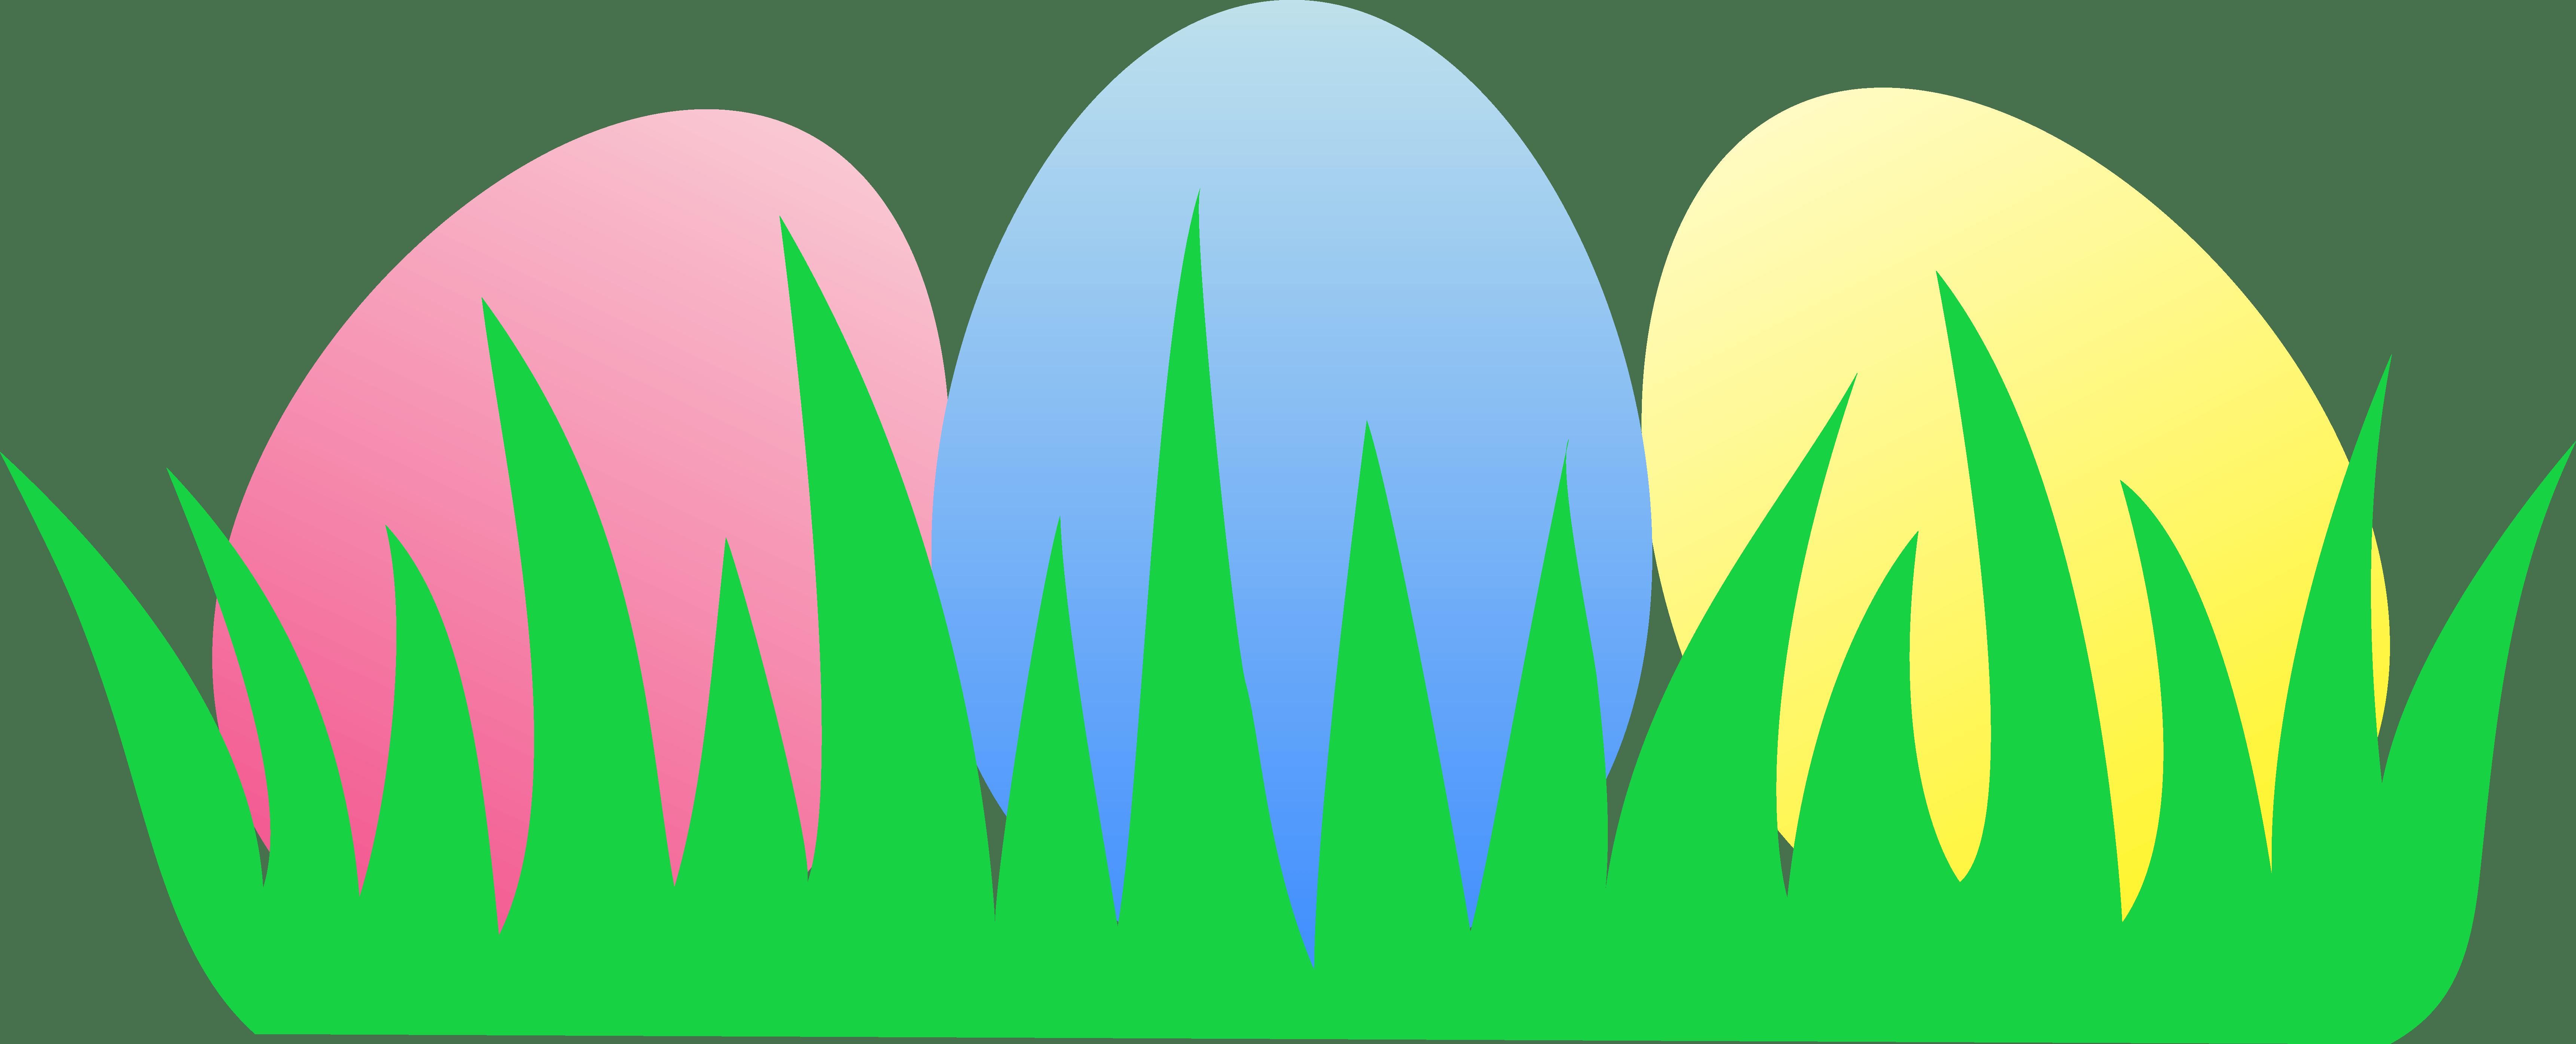 6883x2789 Easter Eggs In Grass Clip Art. Stift Cliparts, Clipart